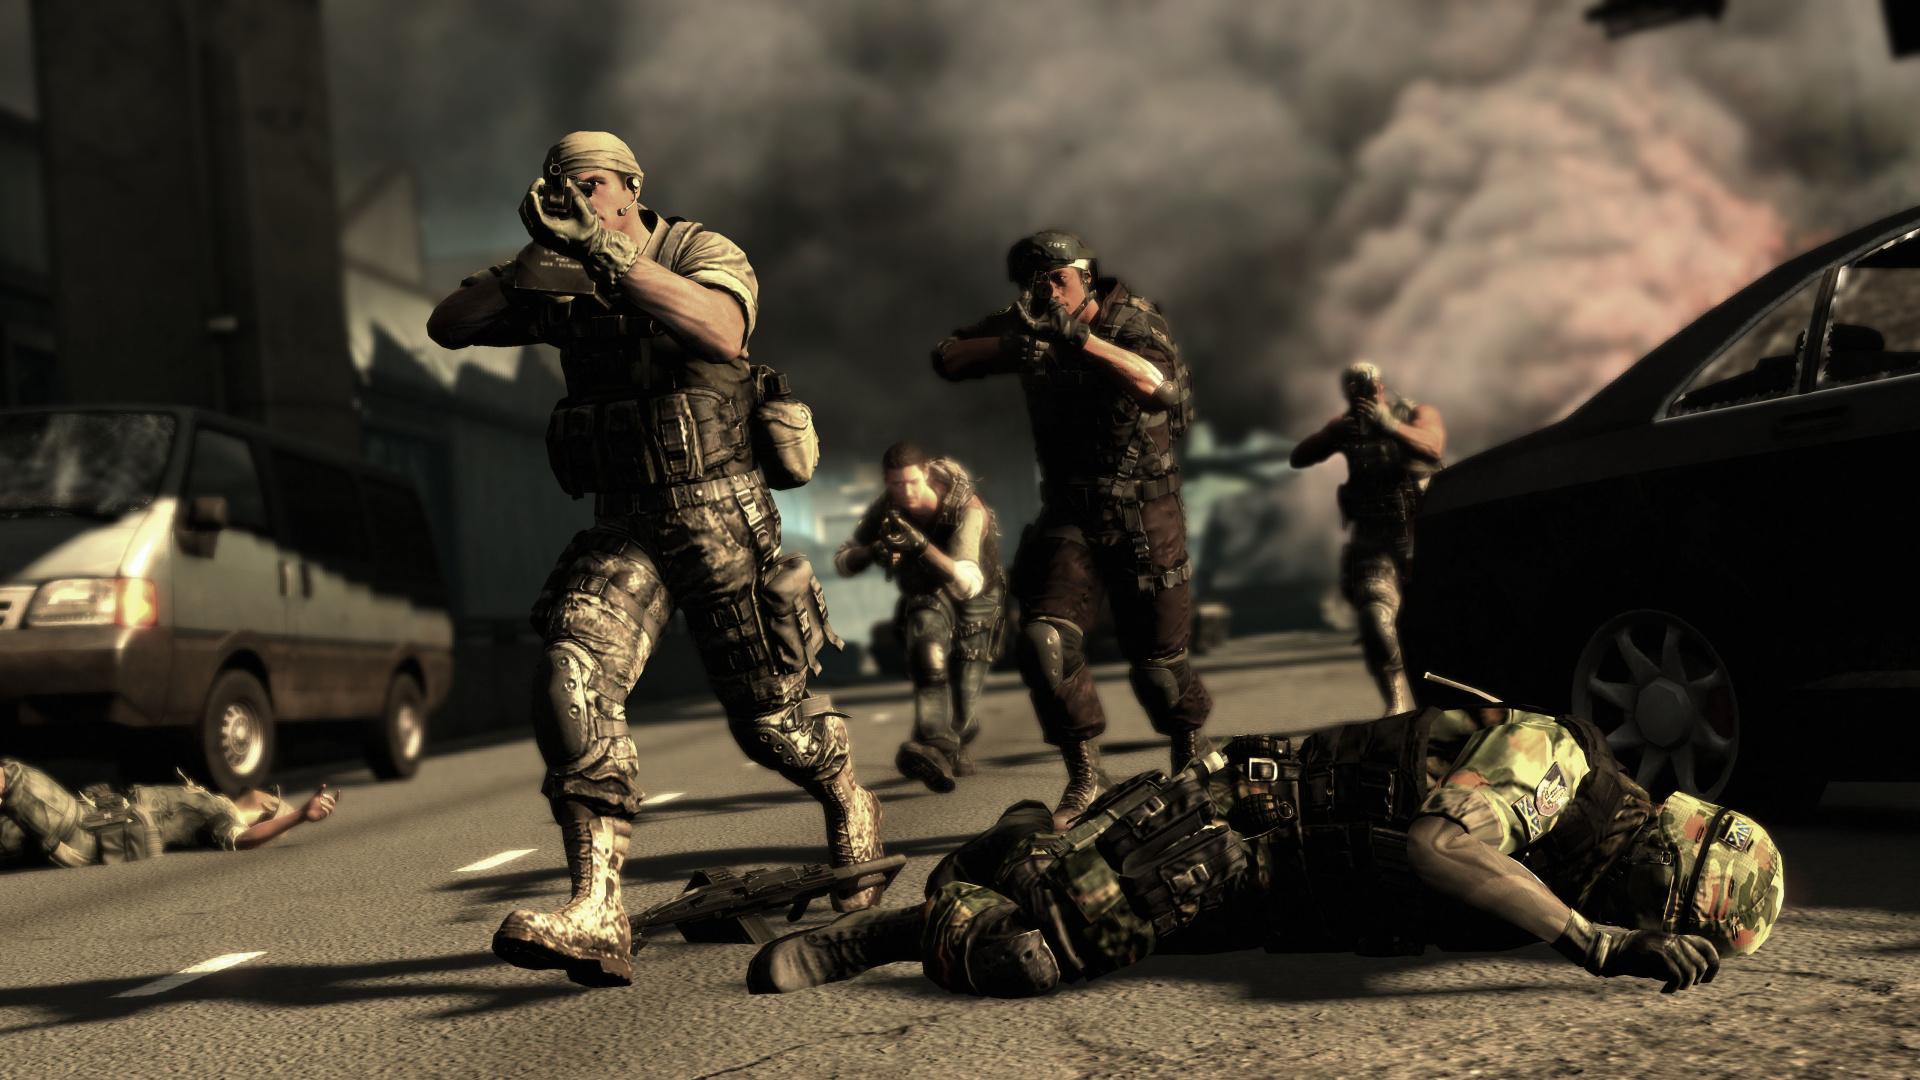 Wallpaper Falling Skies Socom Special Forces Ps3 Playstation 3 News Reviews